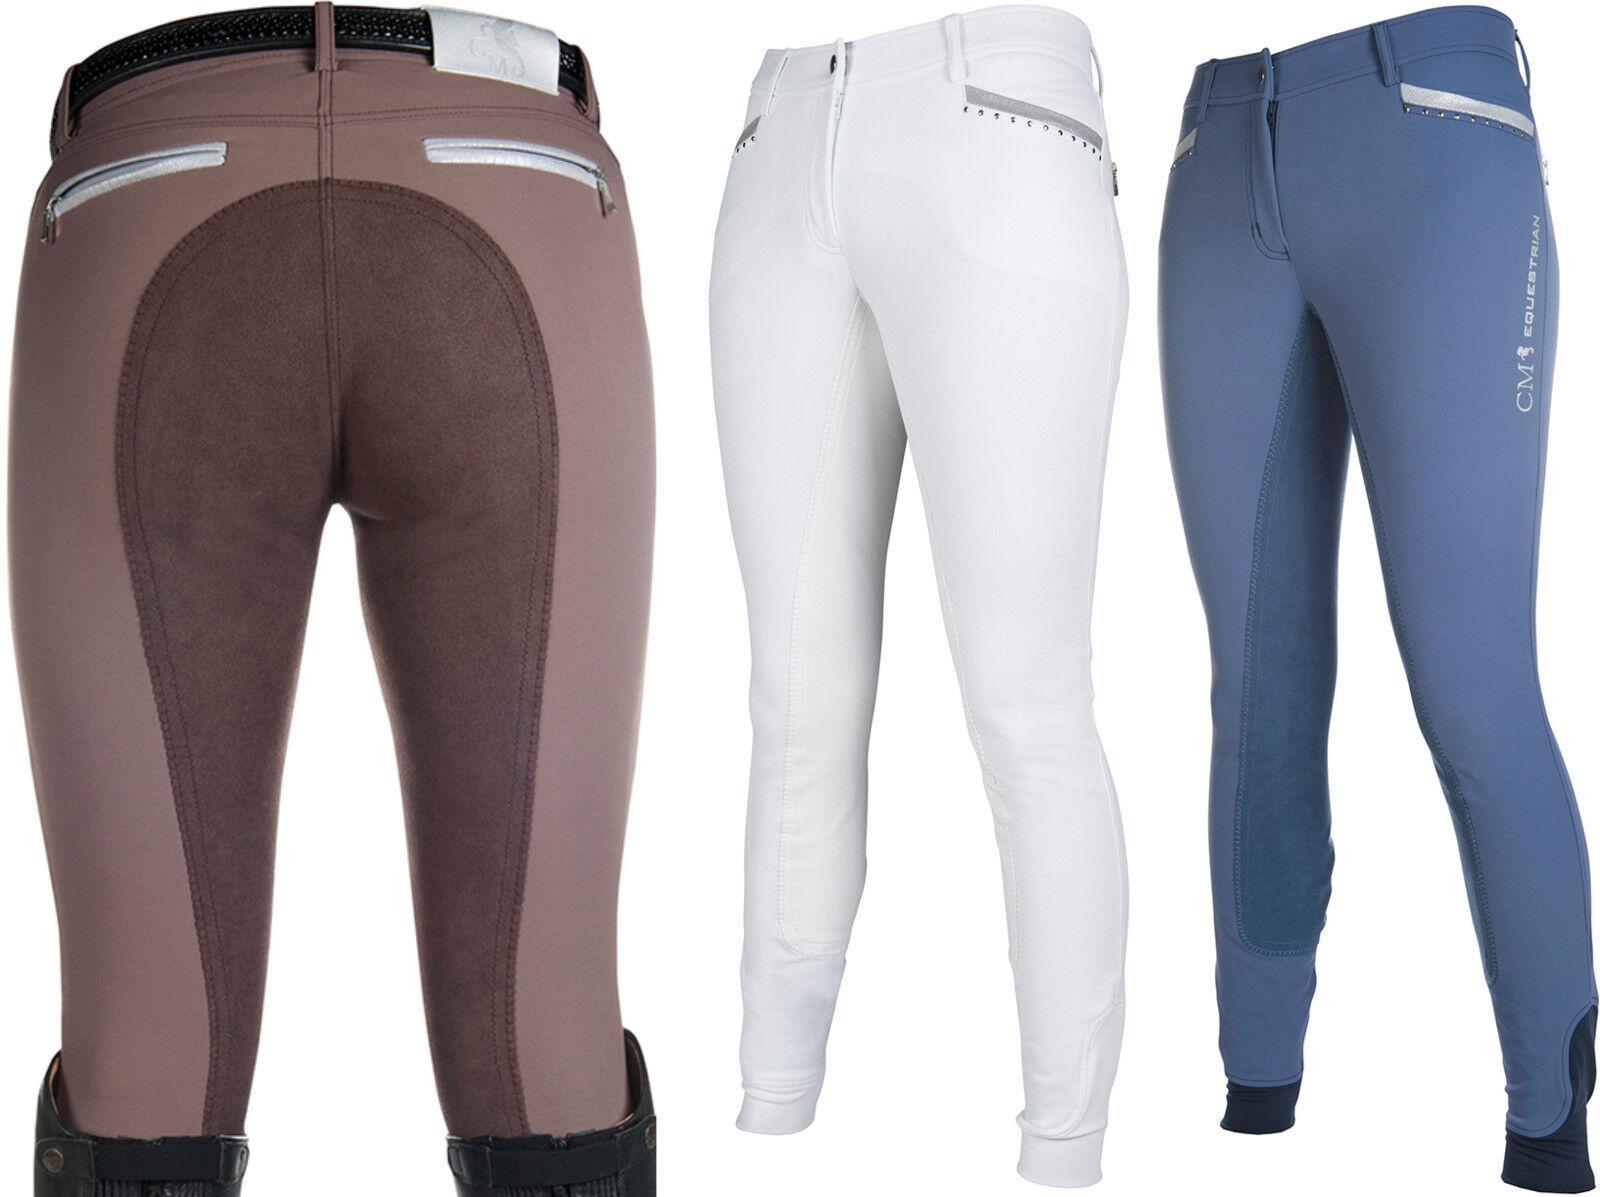 ⭐️ HKM Cavallino Marino Suave Powder Estampado Pantalones Montar 3 4 Alos